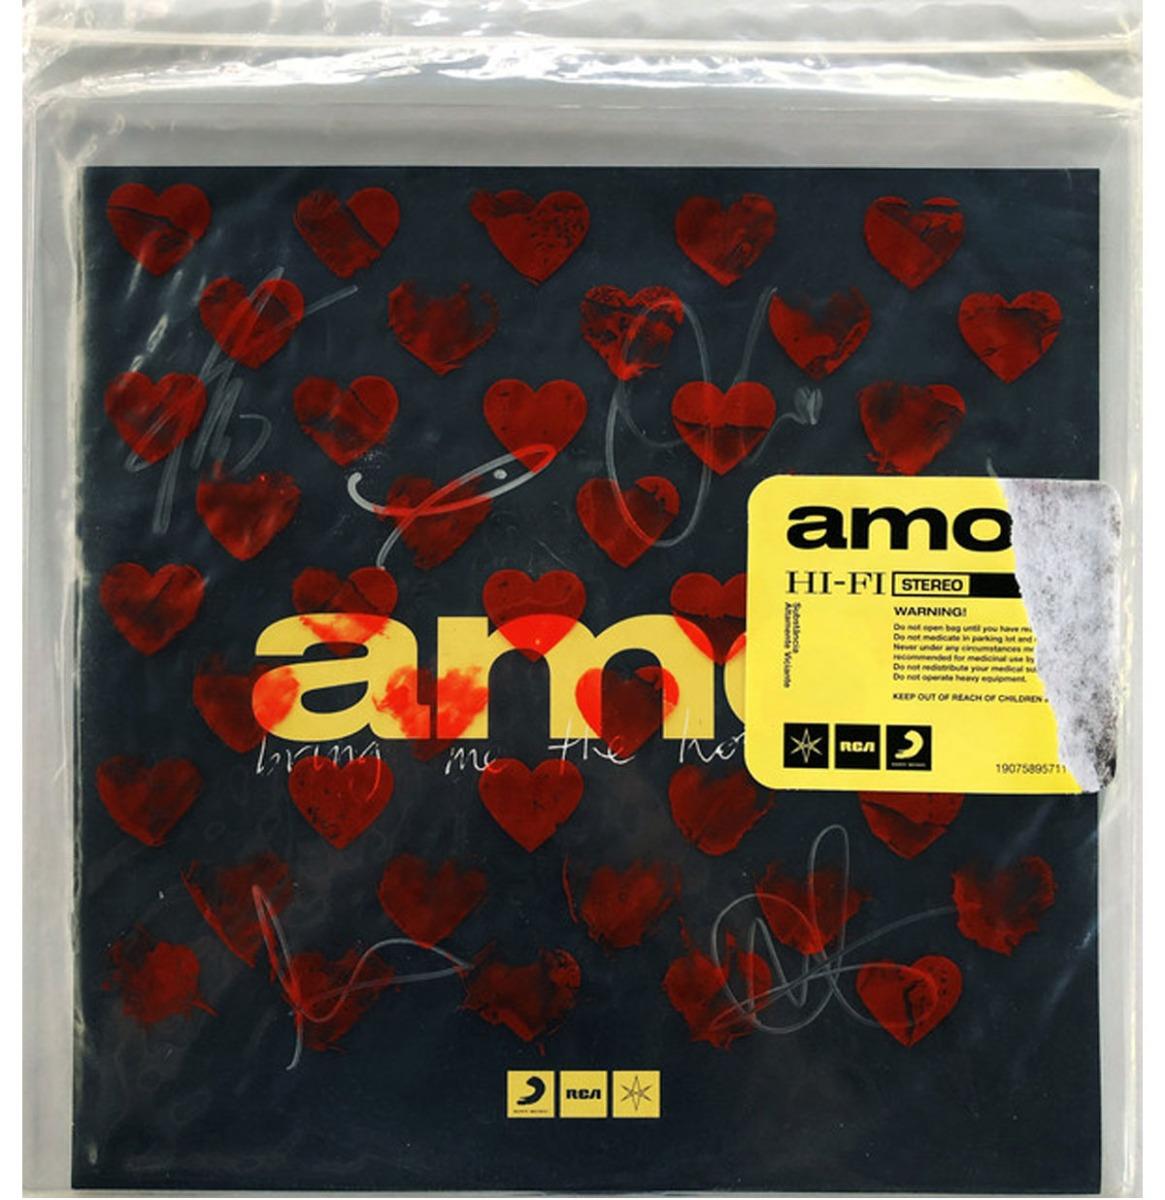 Bring Me The Horizon - Amo (Transparant Vinyl) 2LP